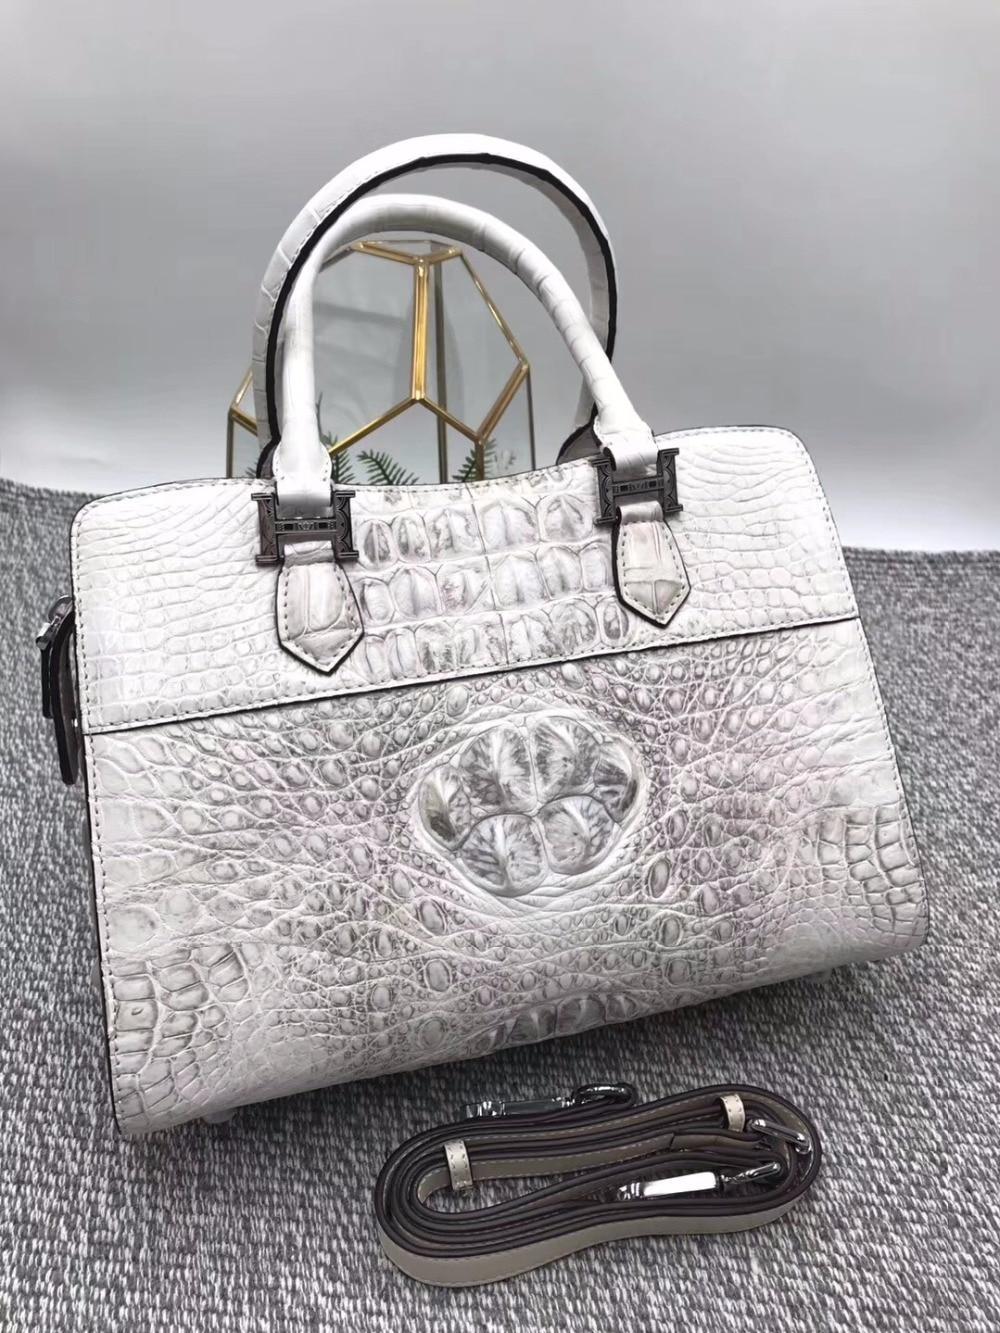 Fashion Three-way Designer Genuine Crocodile Leather Female Totes bag Real Alligator Skin Medium Size Women's Top handle Handbag цена